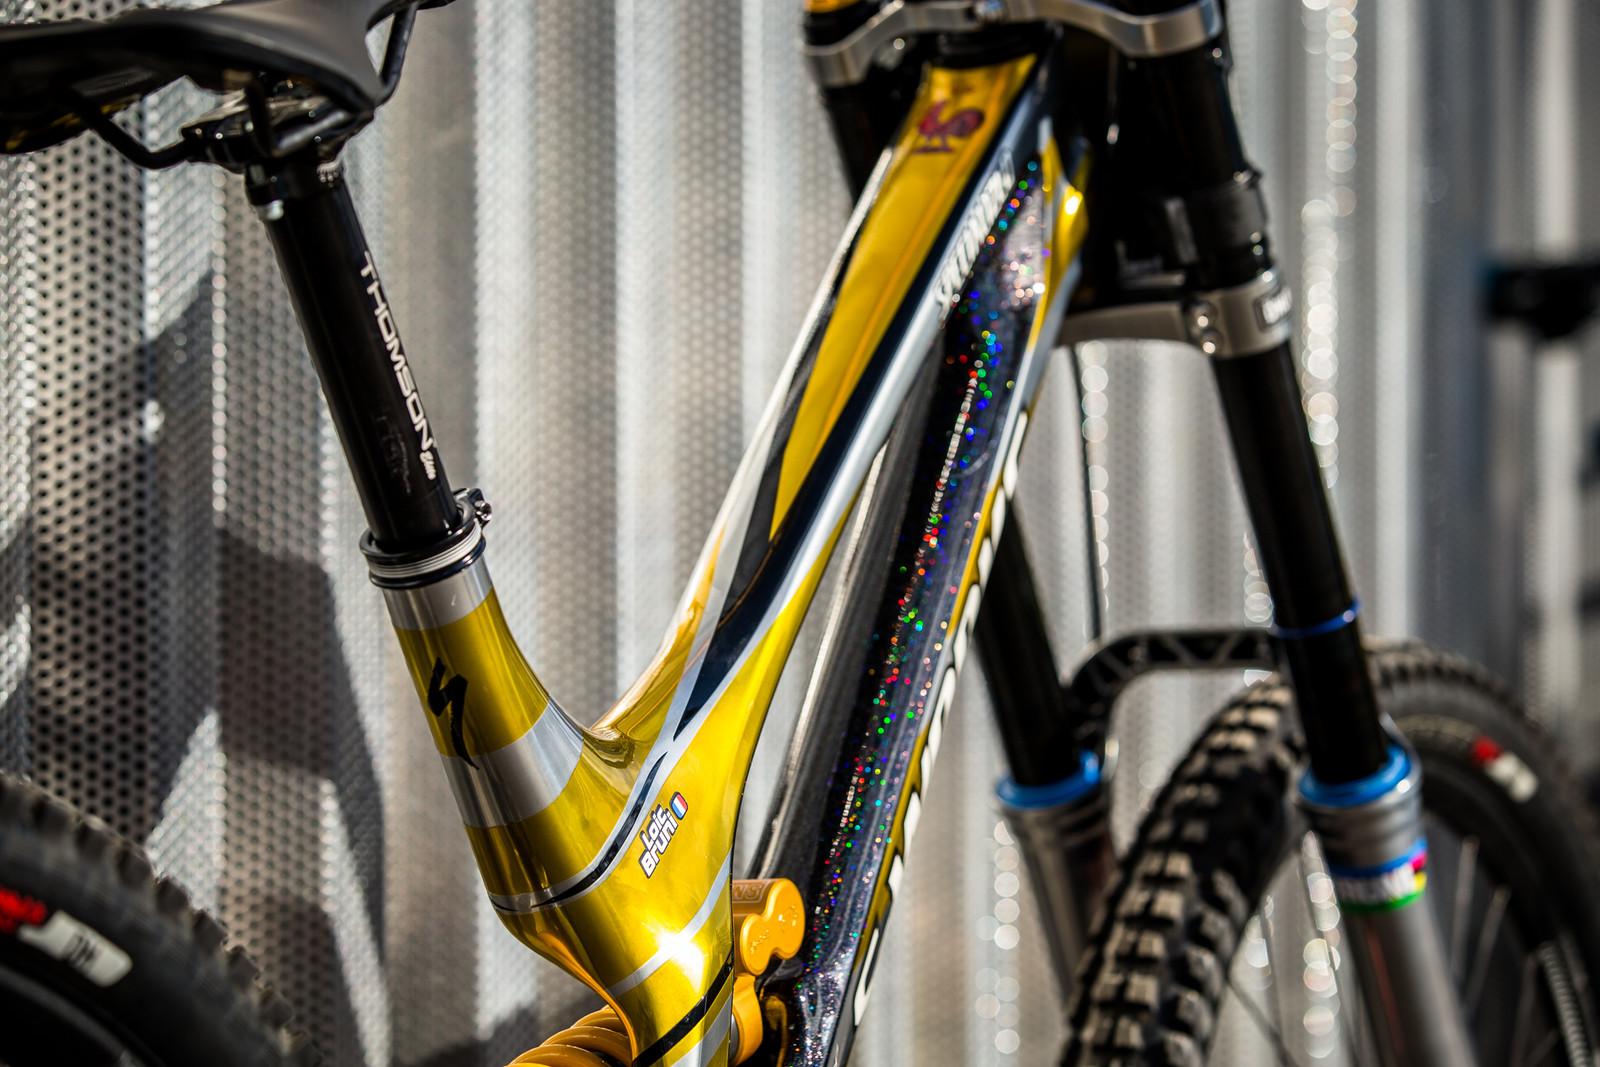 Sleek - WORLD CHAMPS BIKE - Loic Bruni's Specialized Demo - Mountain Biking Pictures - Vital MTB